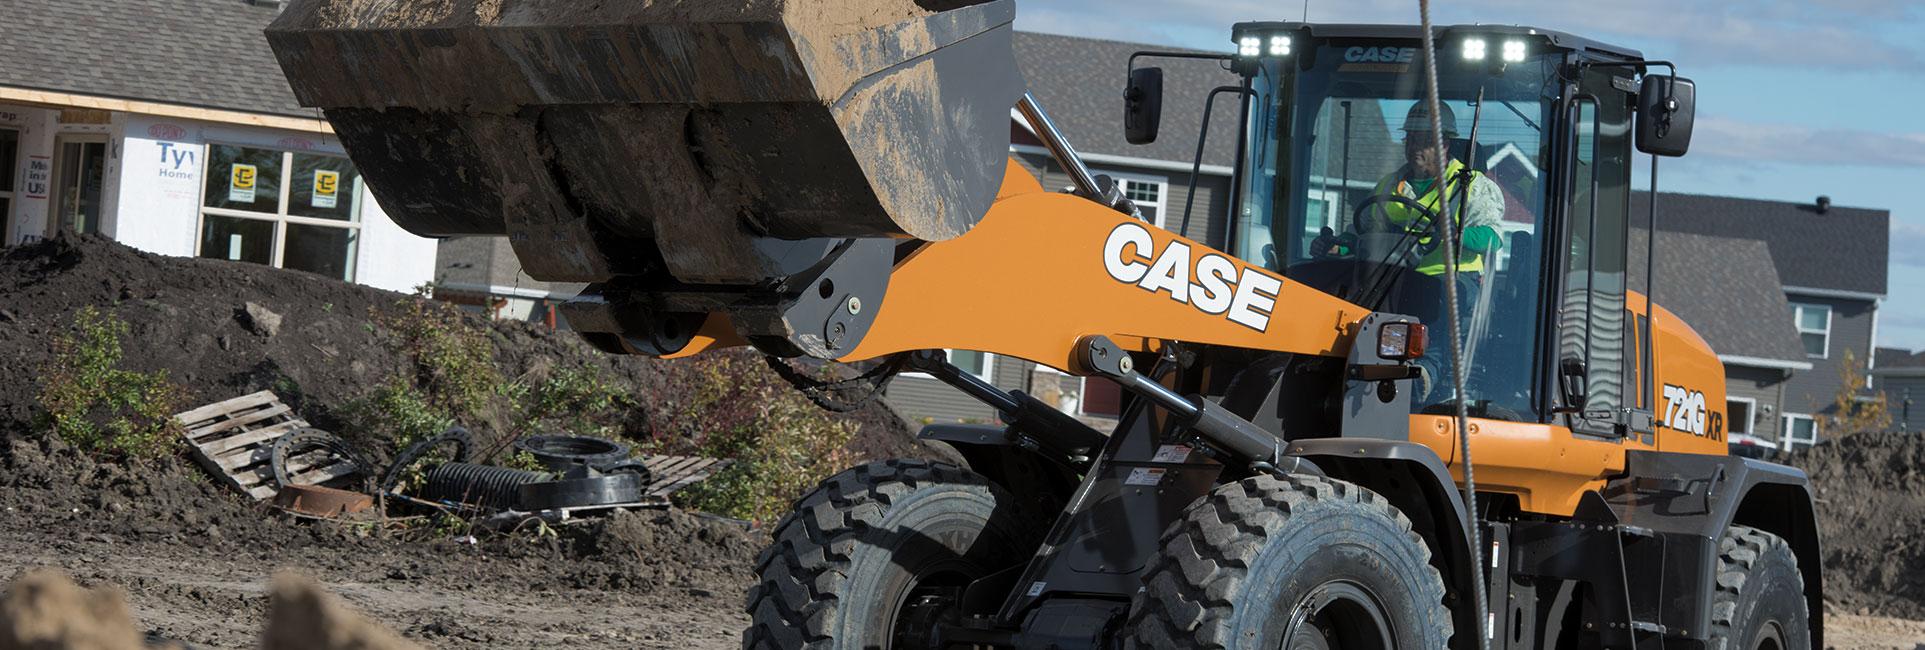 Farm and Construction Equipment Dealer | Titan Machinery